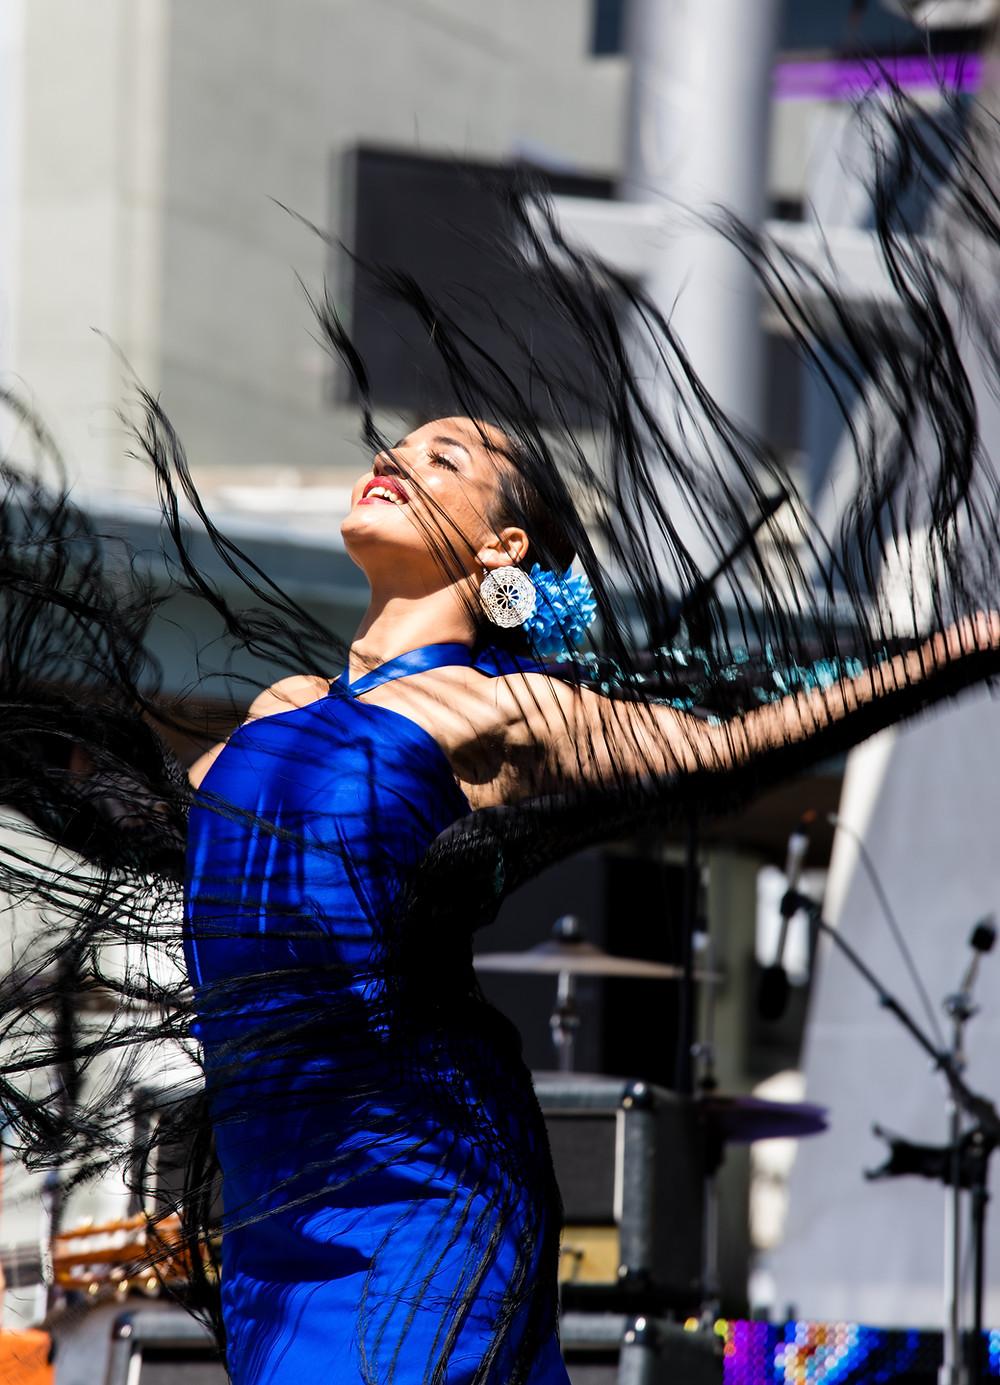 Dancer onstage at desiFEST 2018 in Toronto